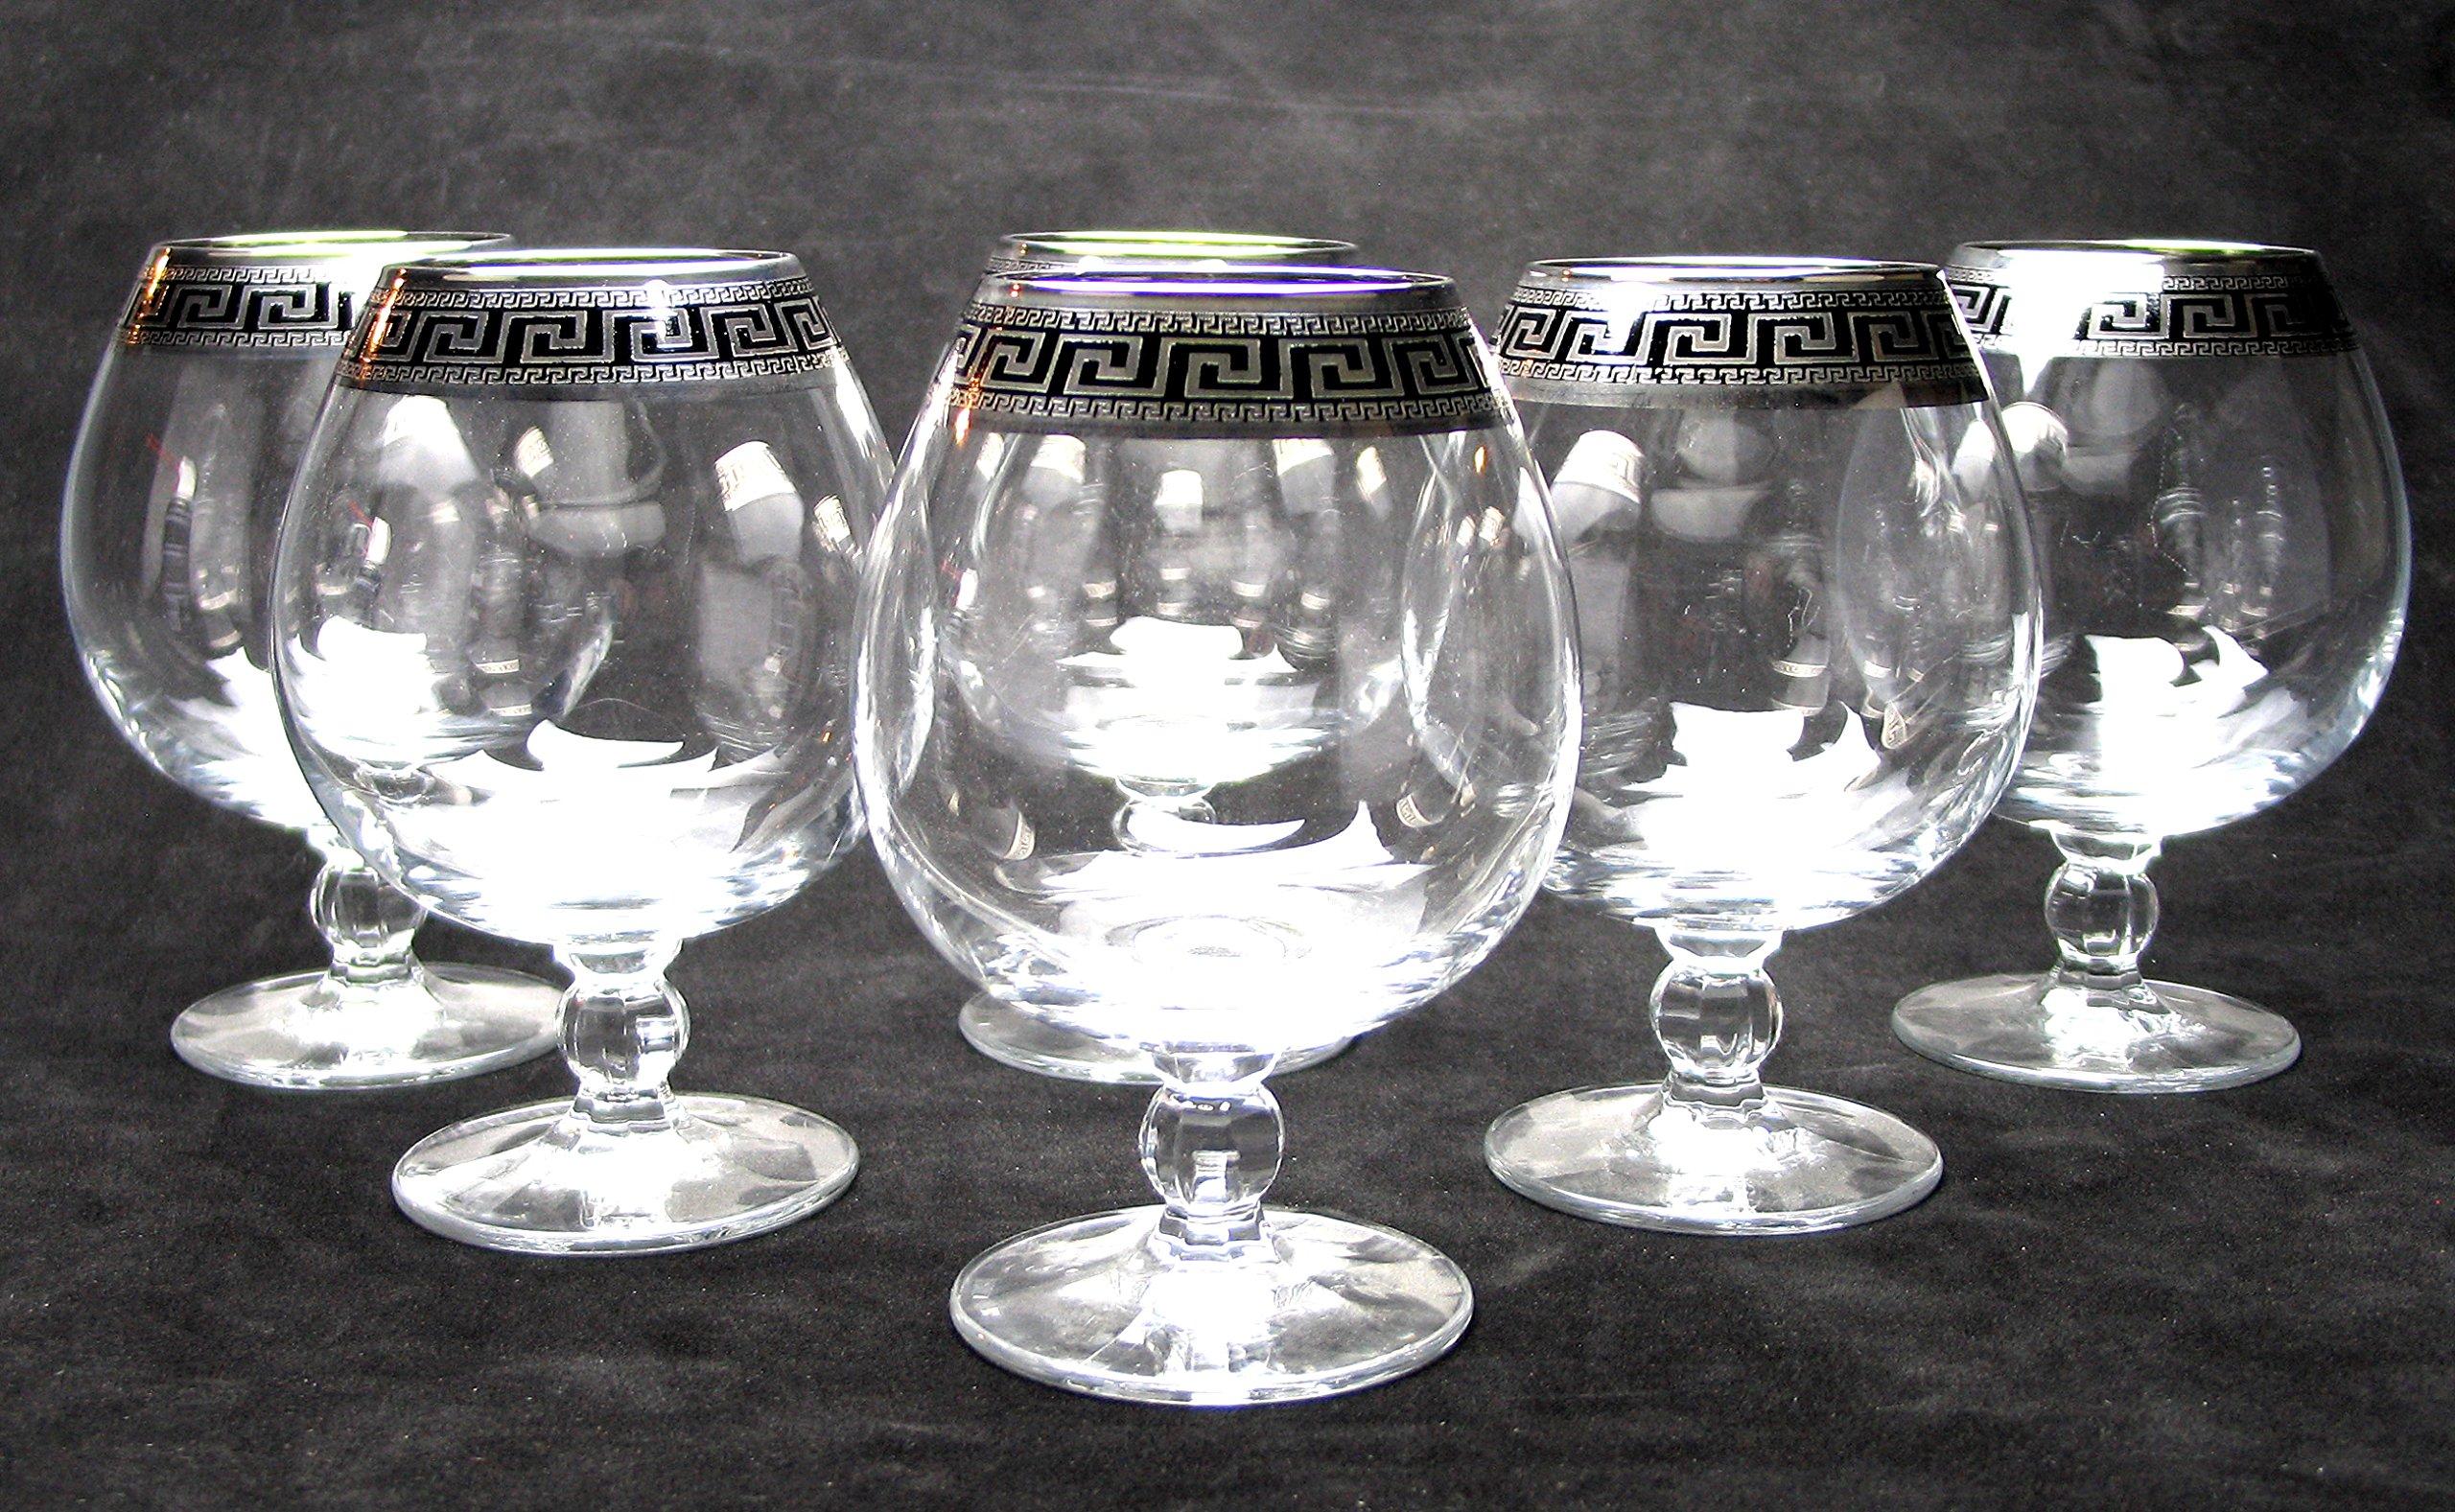 ''Cristalleria Italian Decor'' Crystal Cognac Snifter Goblet, 17 oz. Silver Platinum Greek Key Ornament, Hand Made in Italy, SET OF 6 Glasses